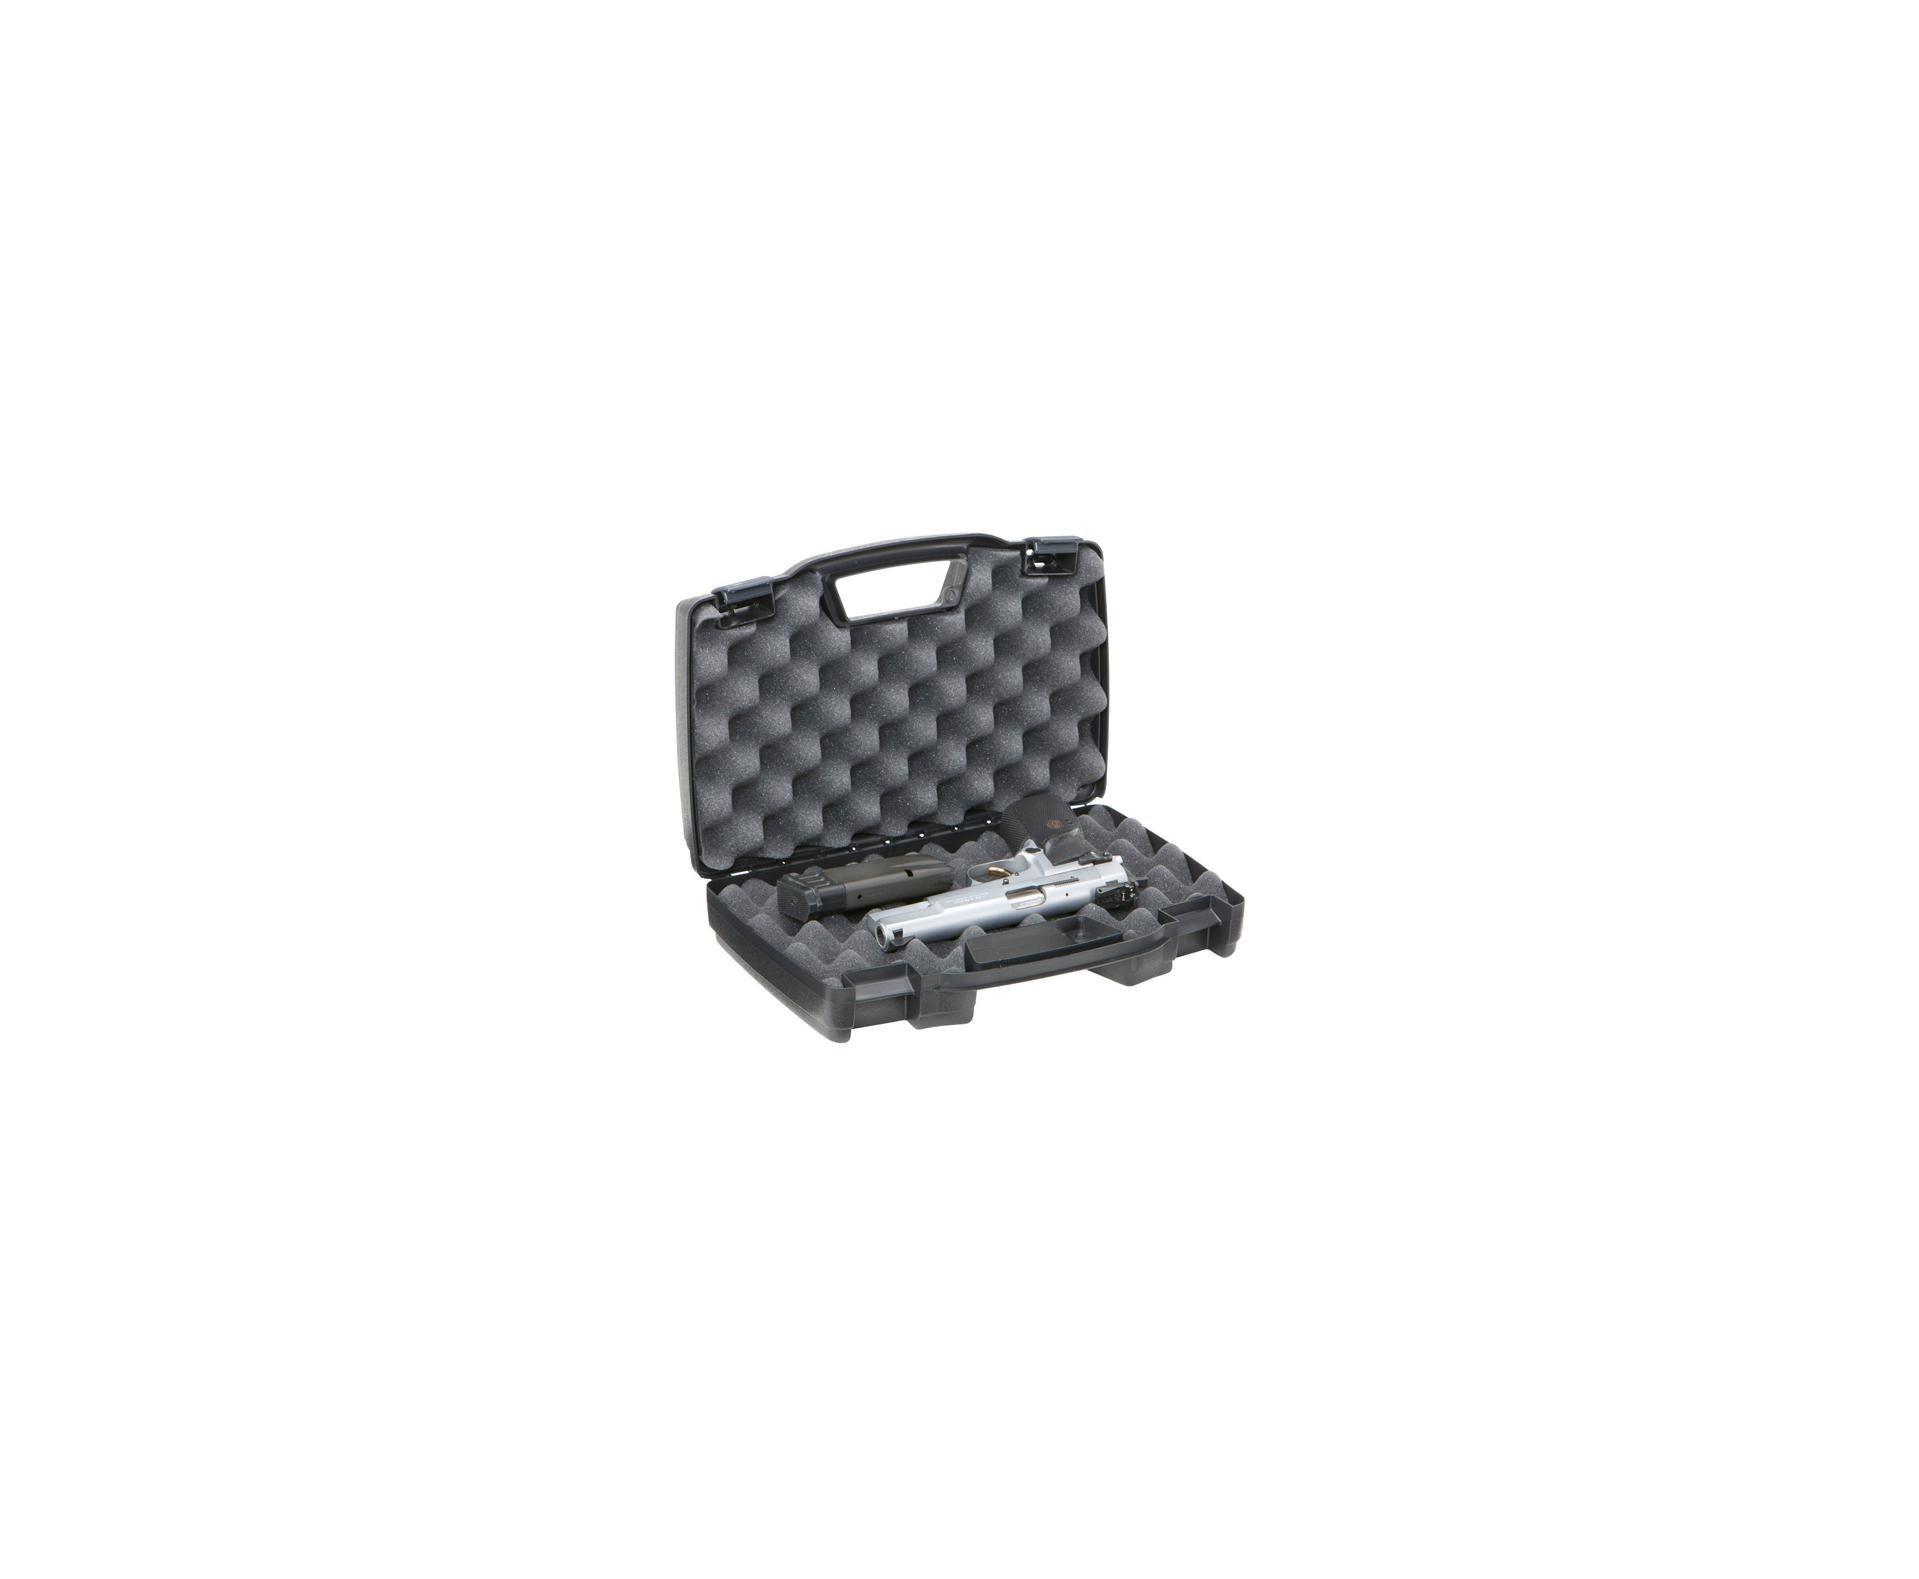 Caixa (case) Para Armas Curtas - 1403-00 - Plano